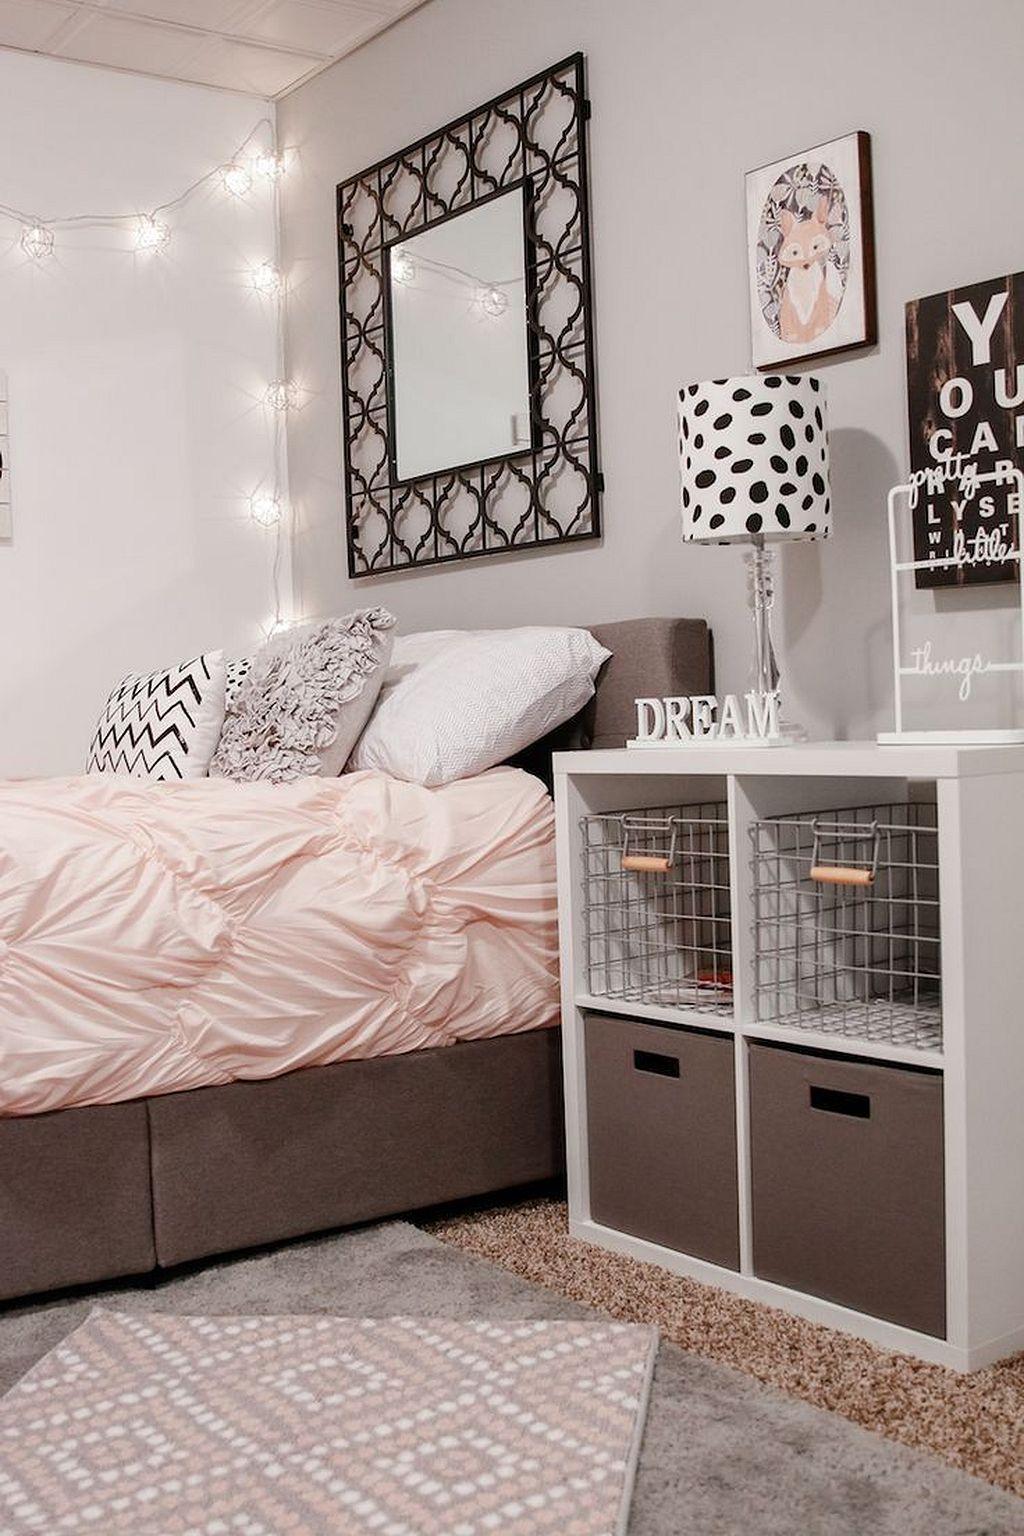 Gorgeous 40 gorgeous teen girl bedroom theme ideas https kidmagz com